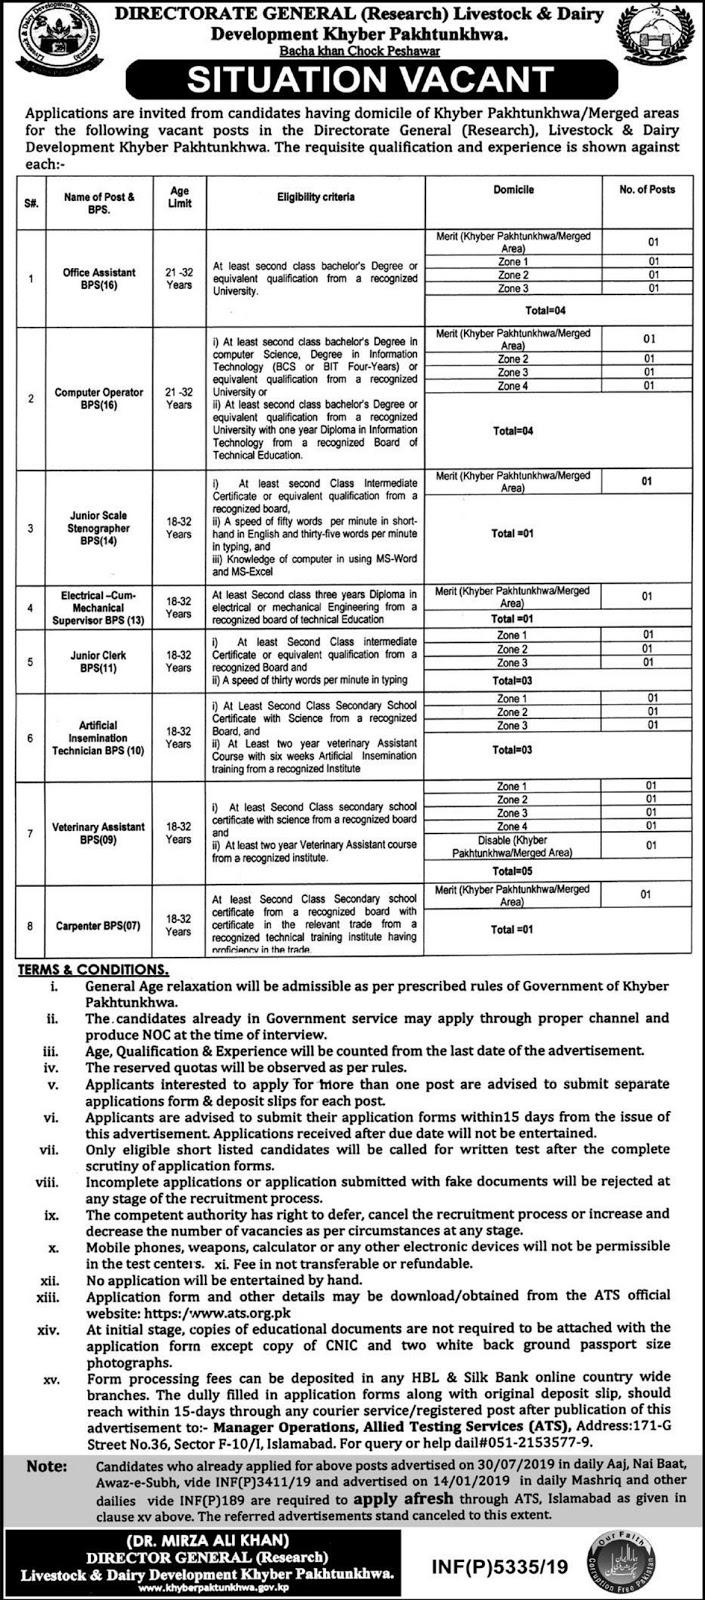 Livestock & Dairy Development Khyber Pakhtunkhwa Jobs